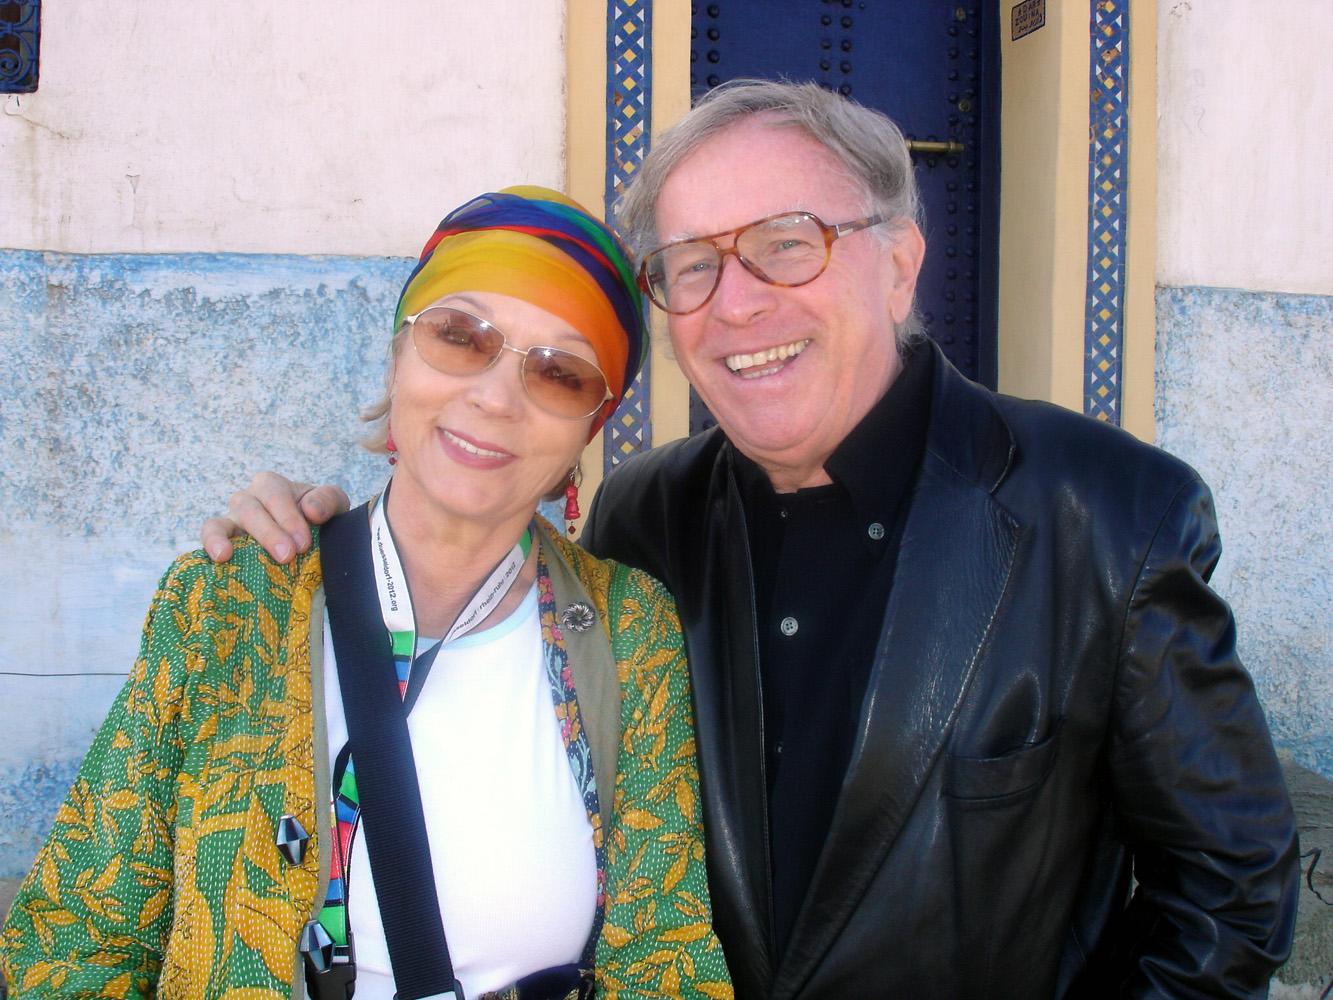 Klaus Doldinger mit Frau Inge